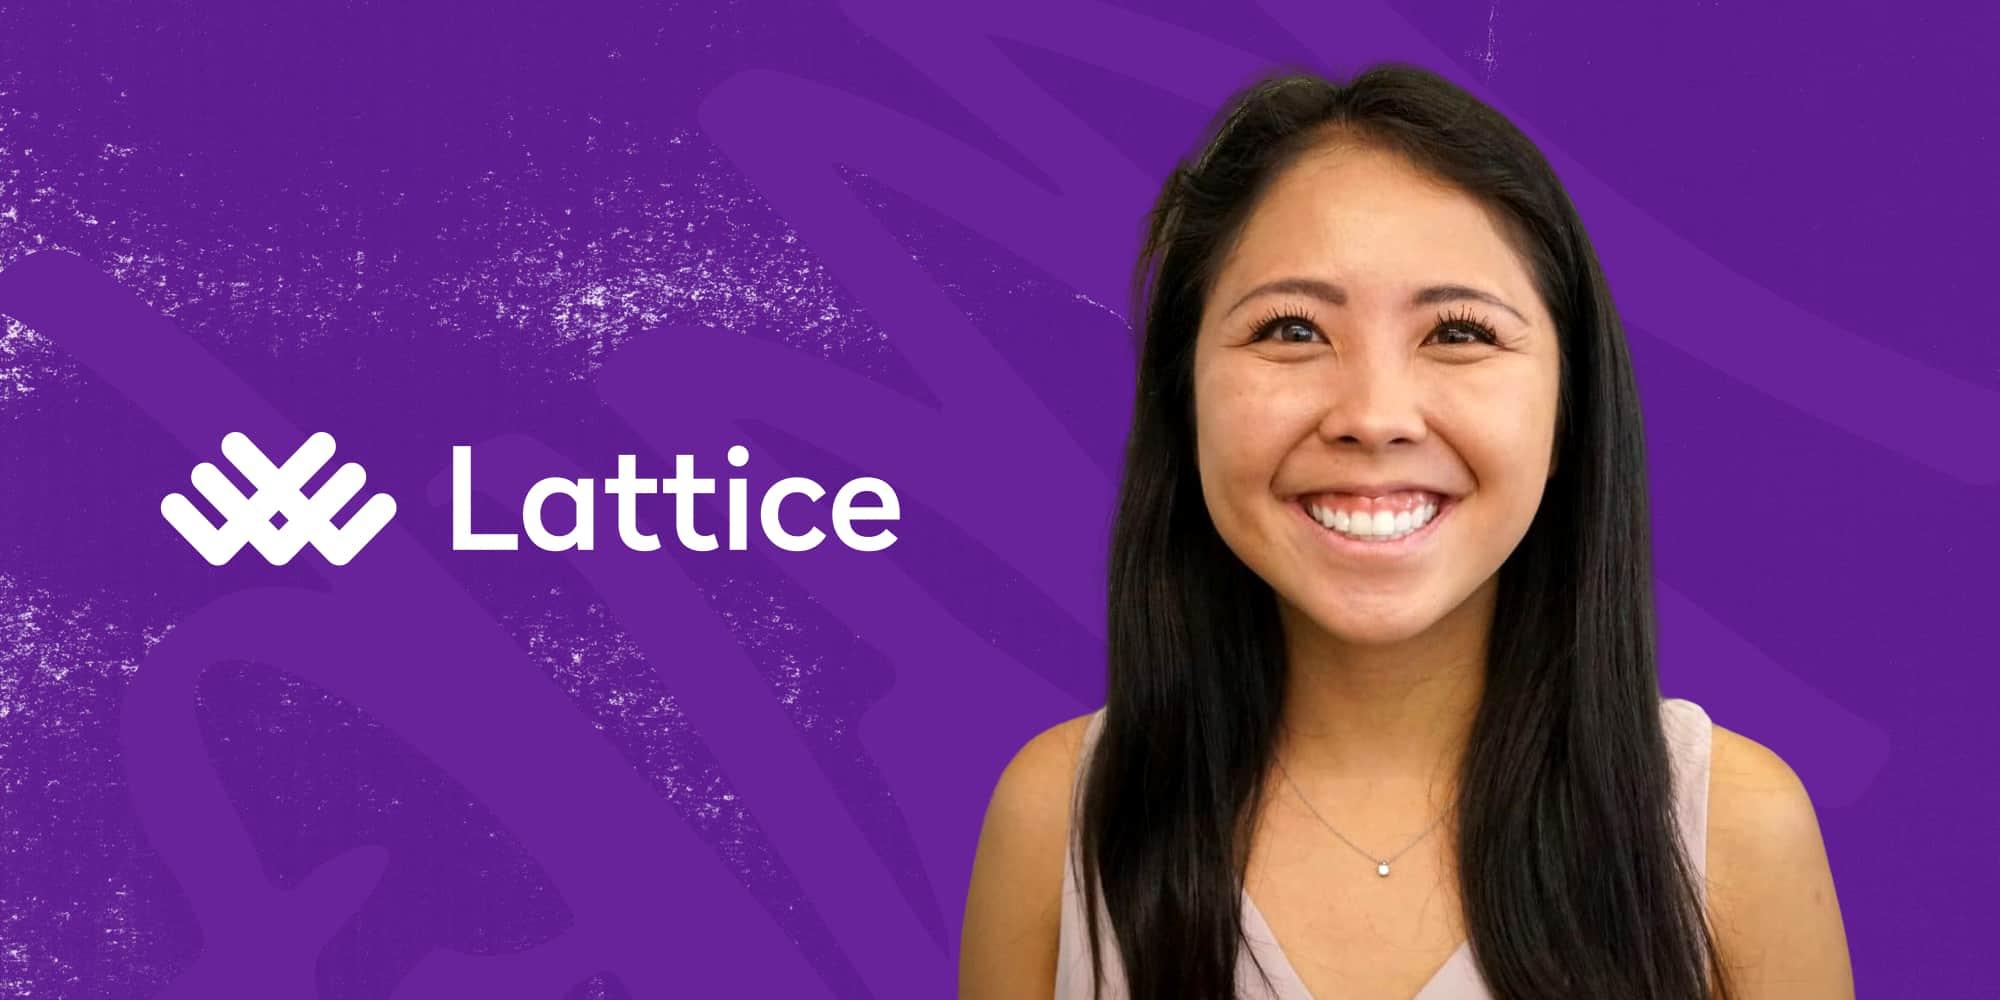 Lattice Switch From Intercom To Drift